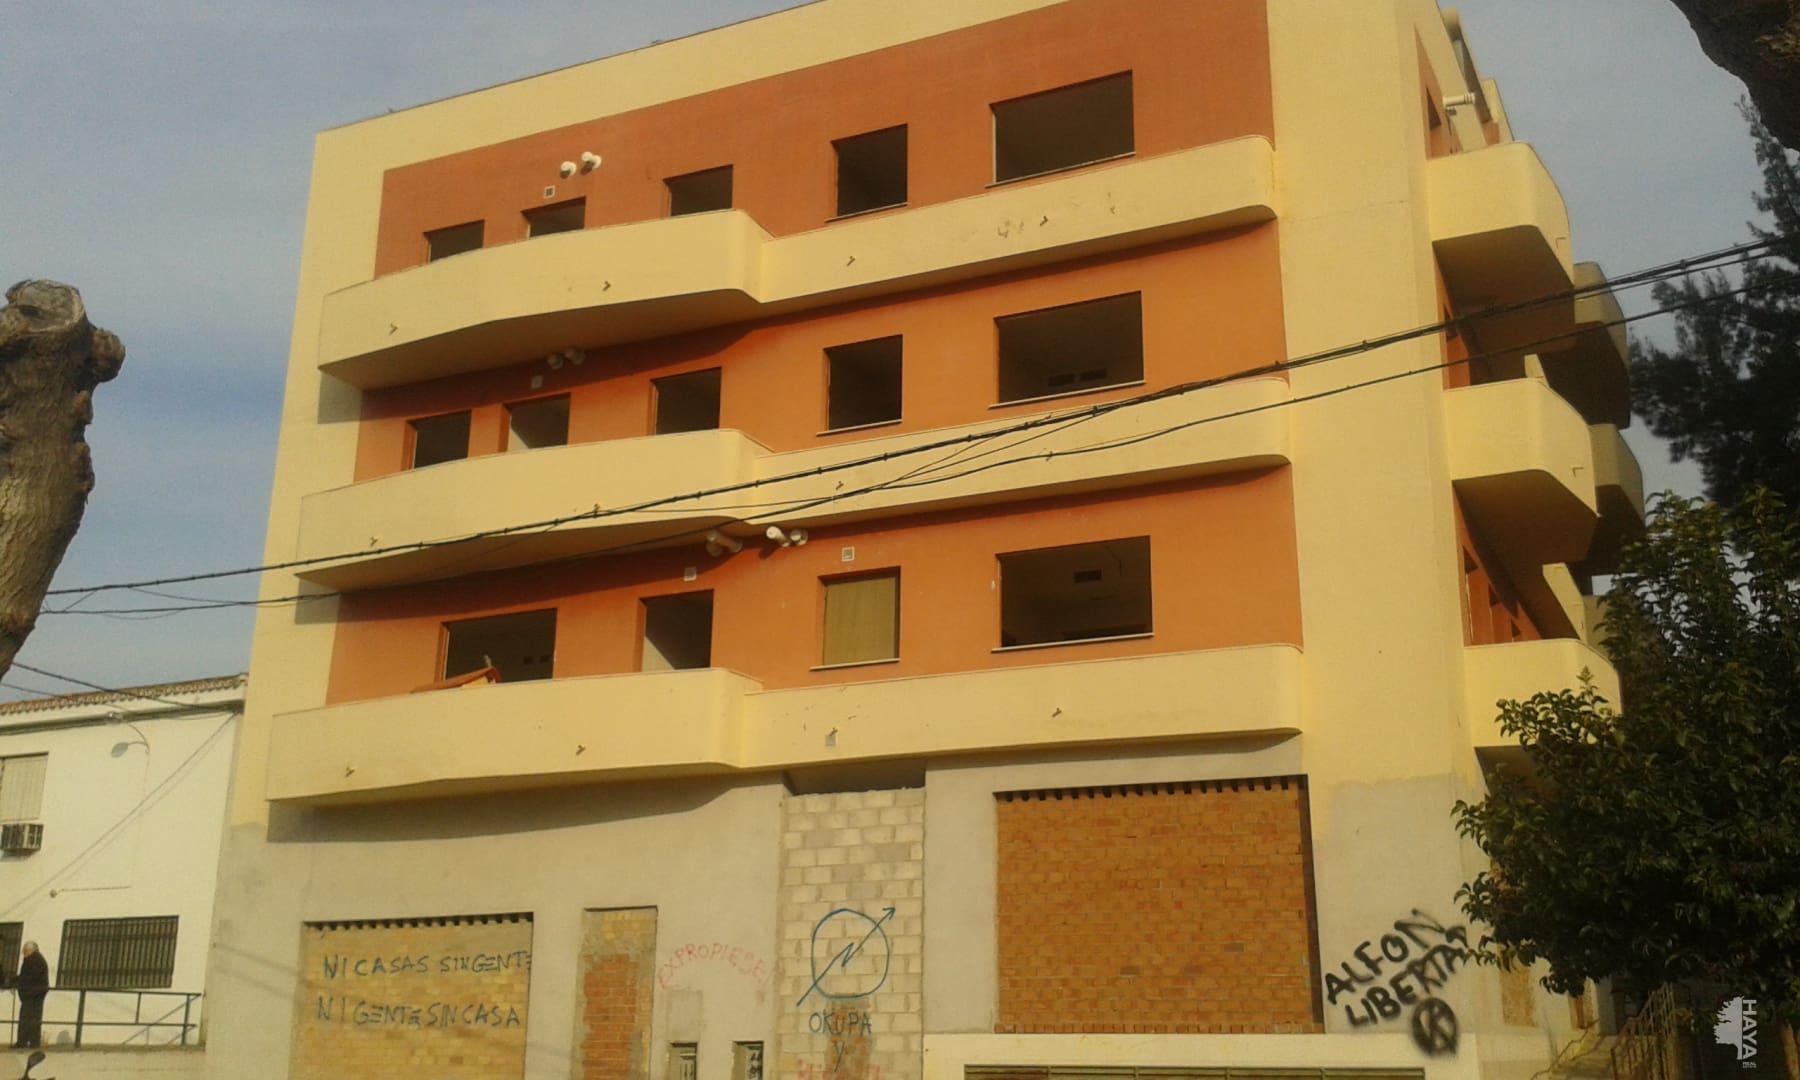 Pisos y casas en san juan de aznalfarache sevilla pisos for Pisos y casas en sevilla